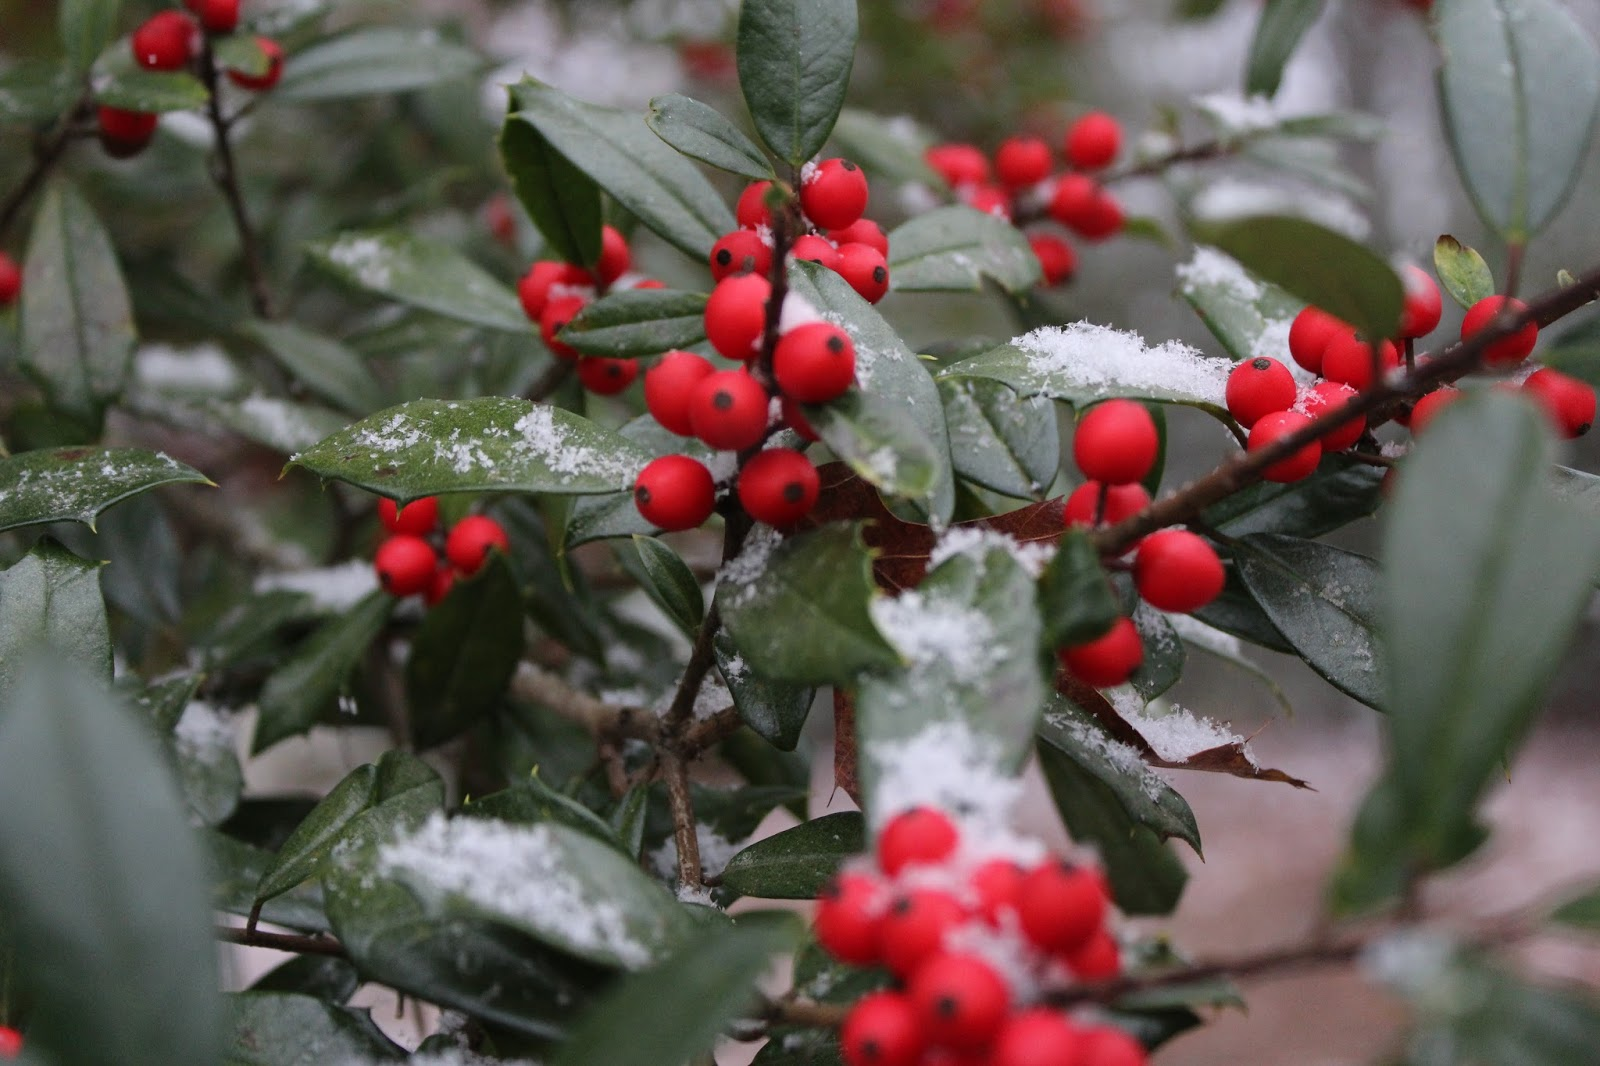 Appalachian Mountain Roots: Appalachian Traditions: Old Christmas